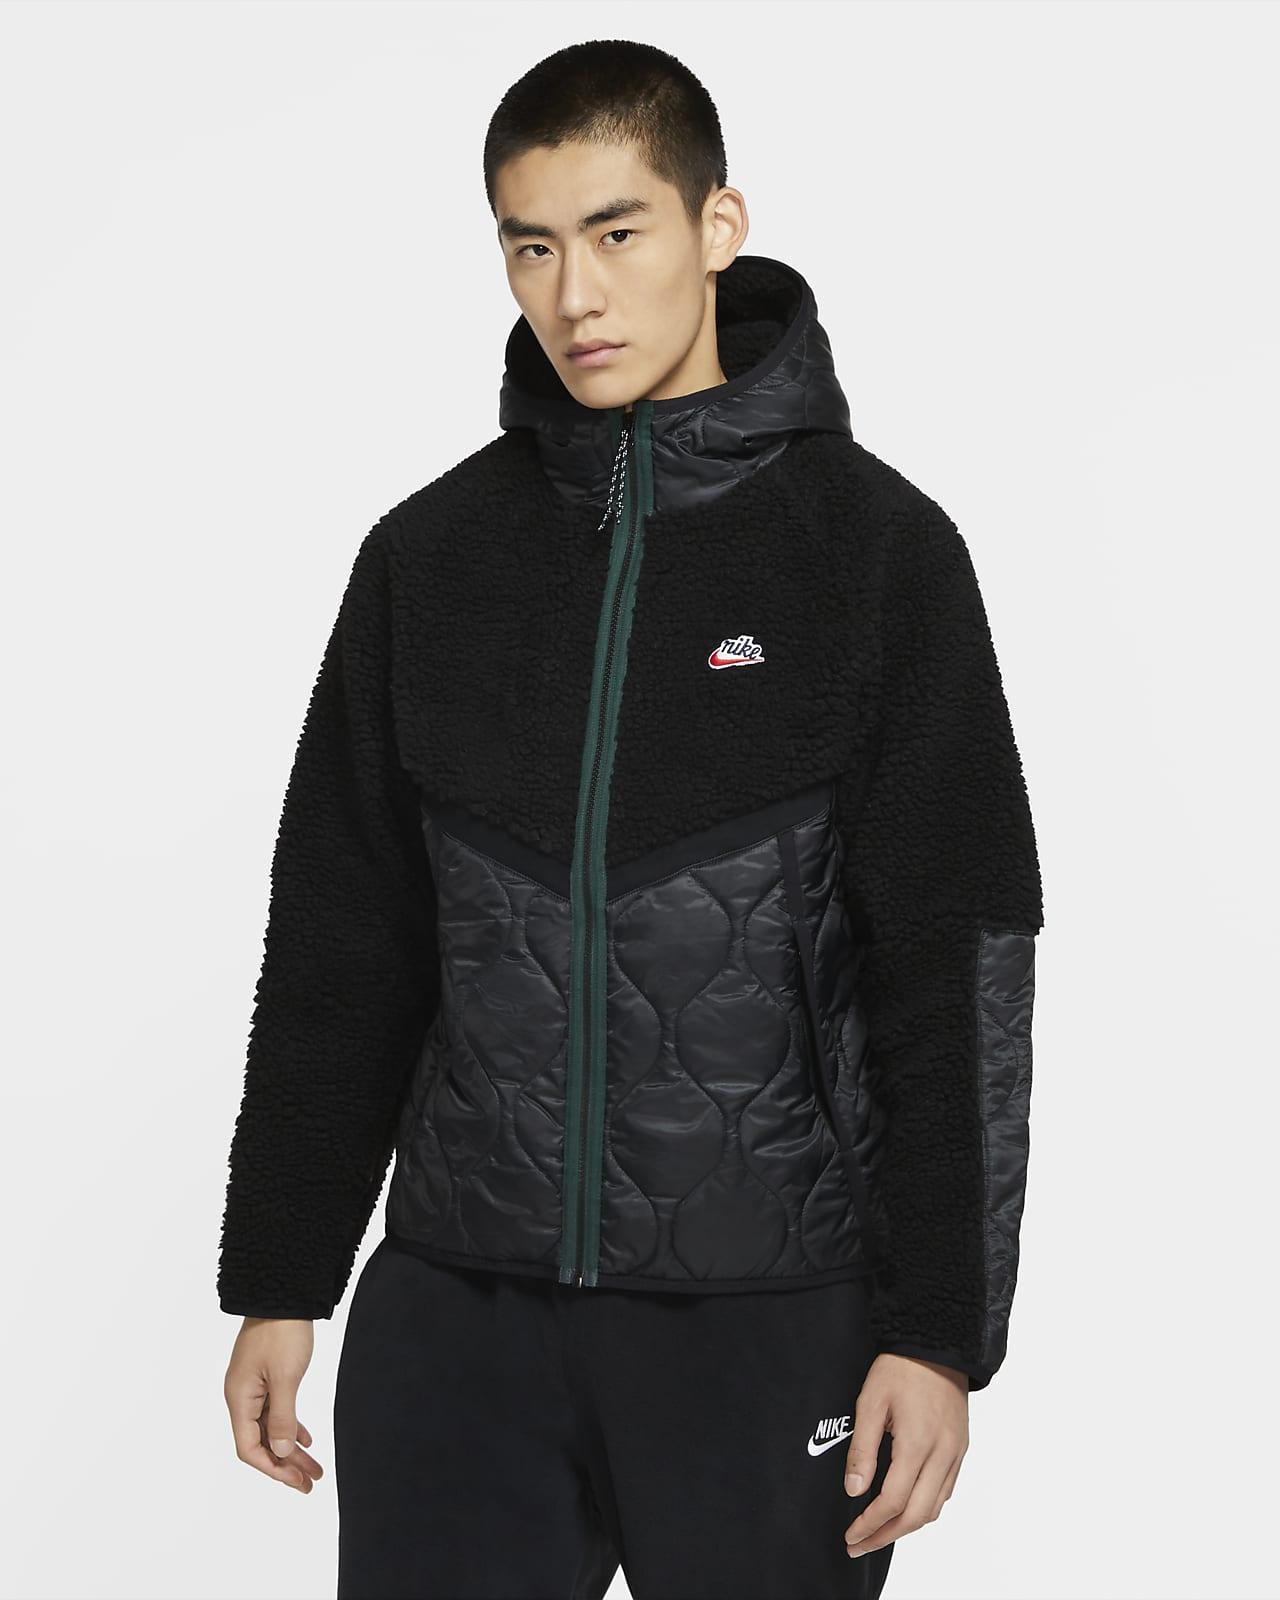 Nike Sportswear Heritage 男子夹克